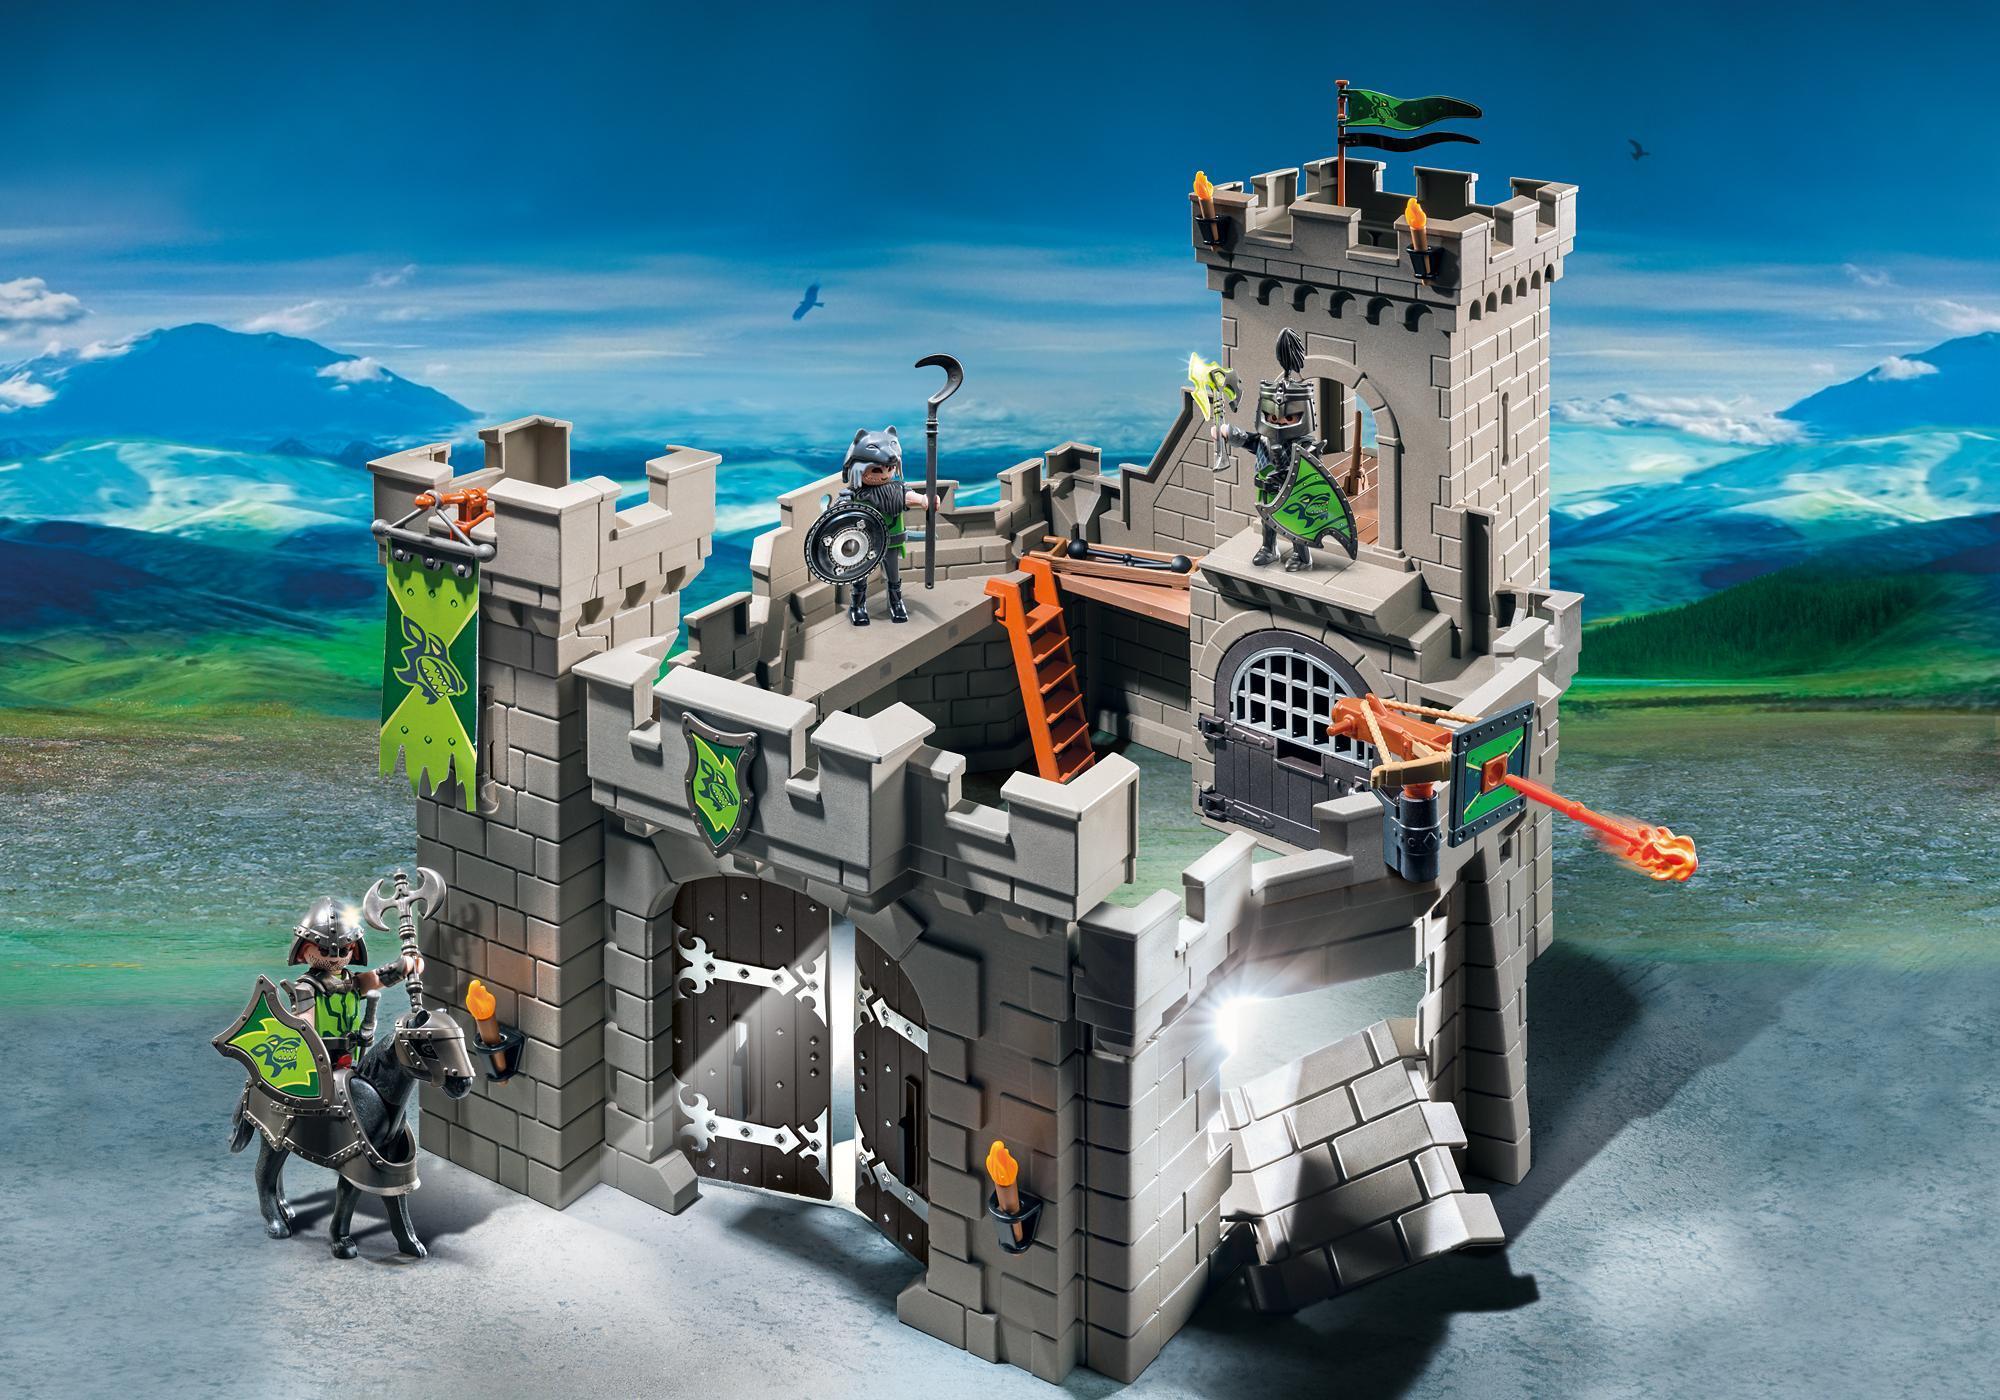 http://media.playmobil.com/i/playmobil/6002_product_detail/Forteca rycerzy herbu Wilk